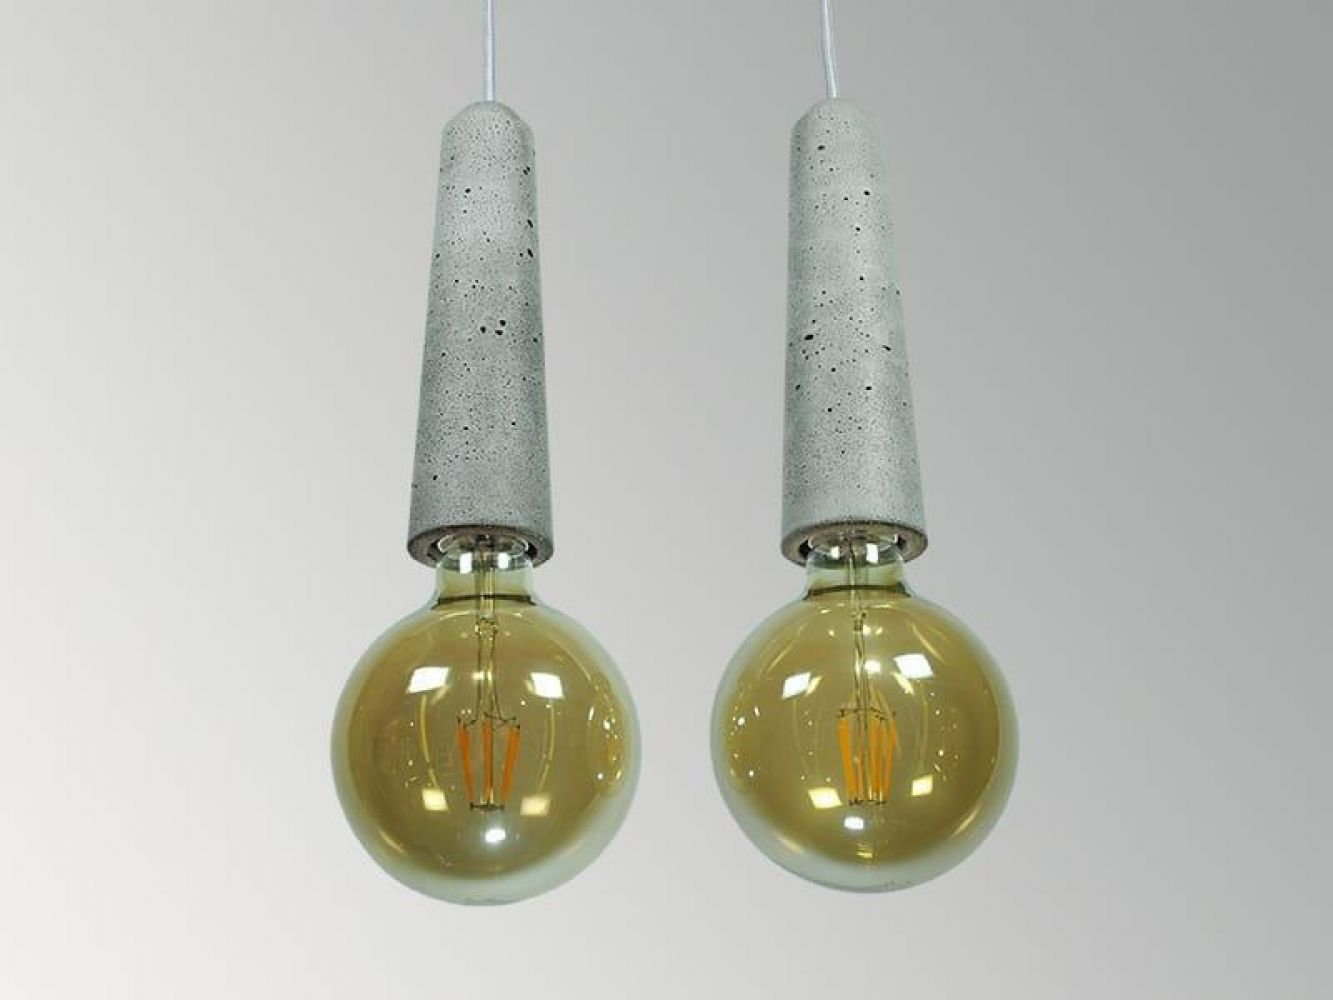 Ecolight Deco 001322